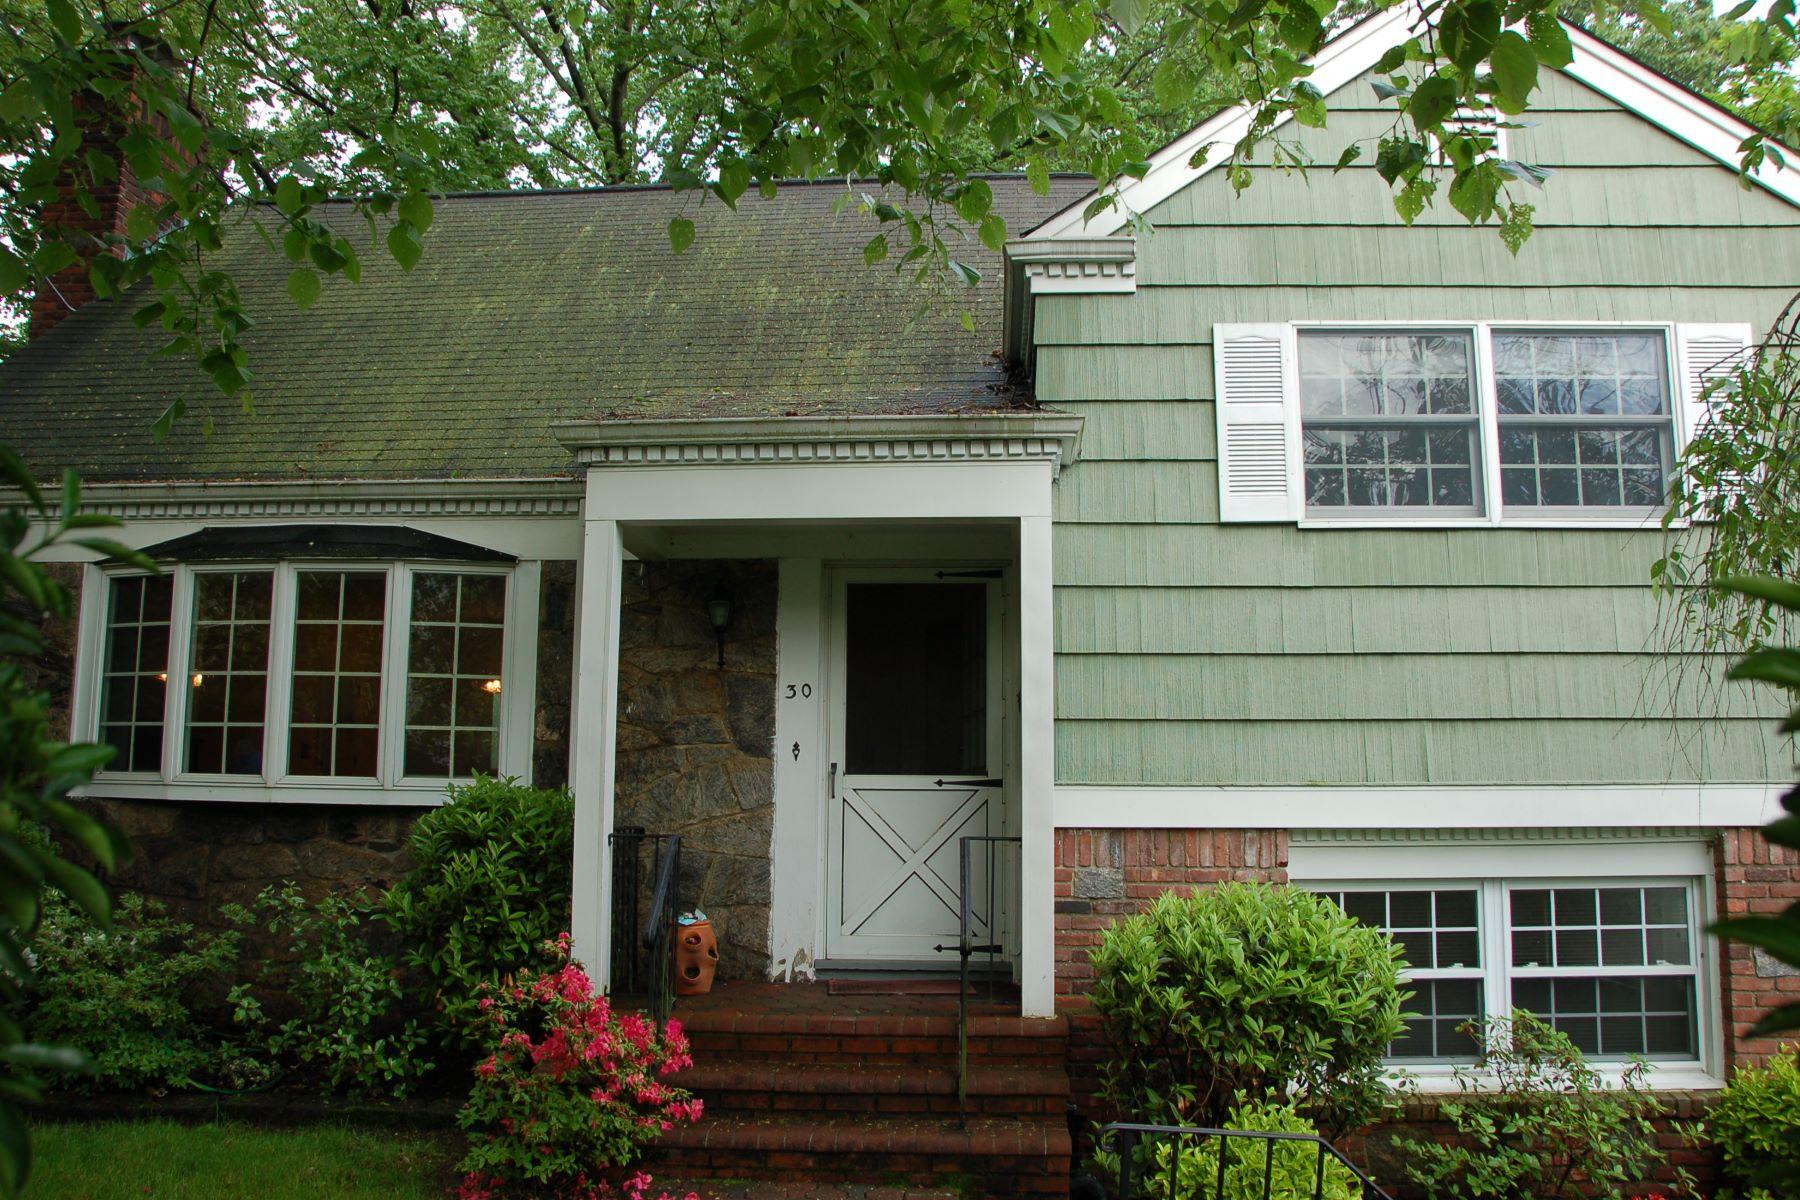 Property للـ Rent في Port Washington 30 Irma Avenue, Port Washington, New York 11050 United States